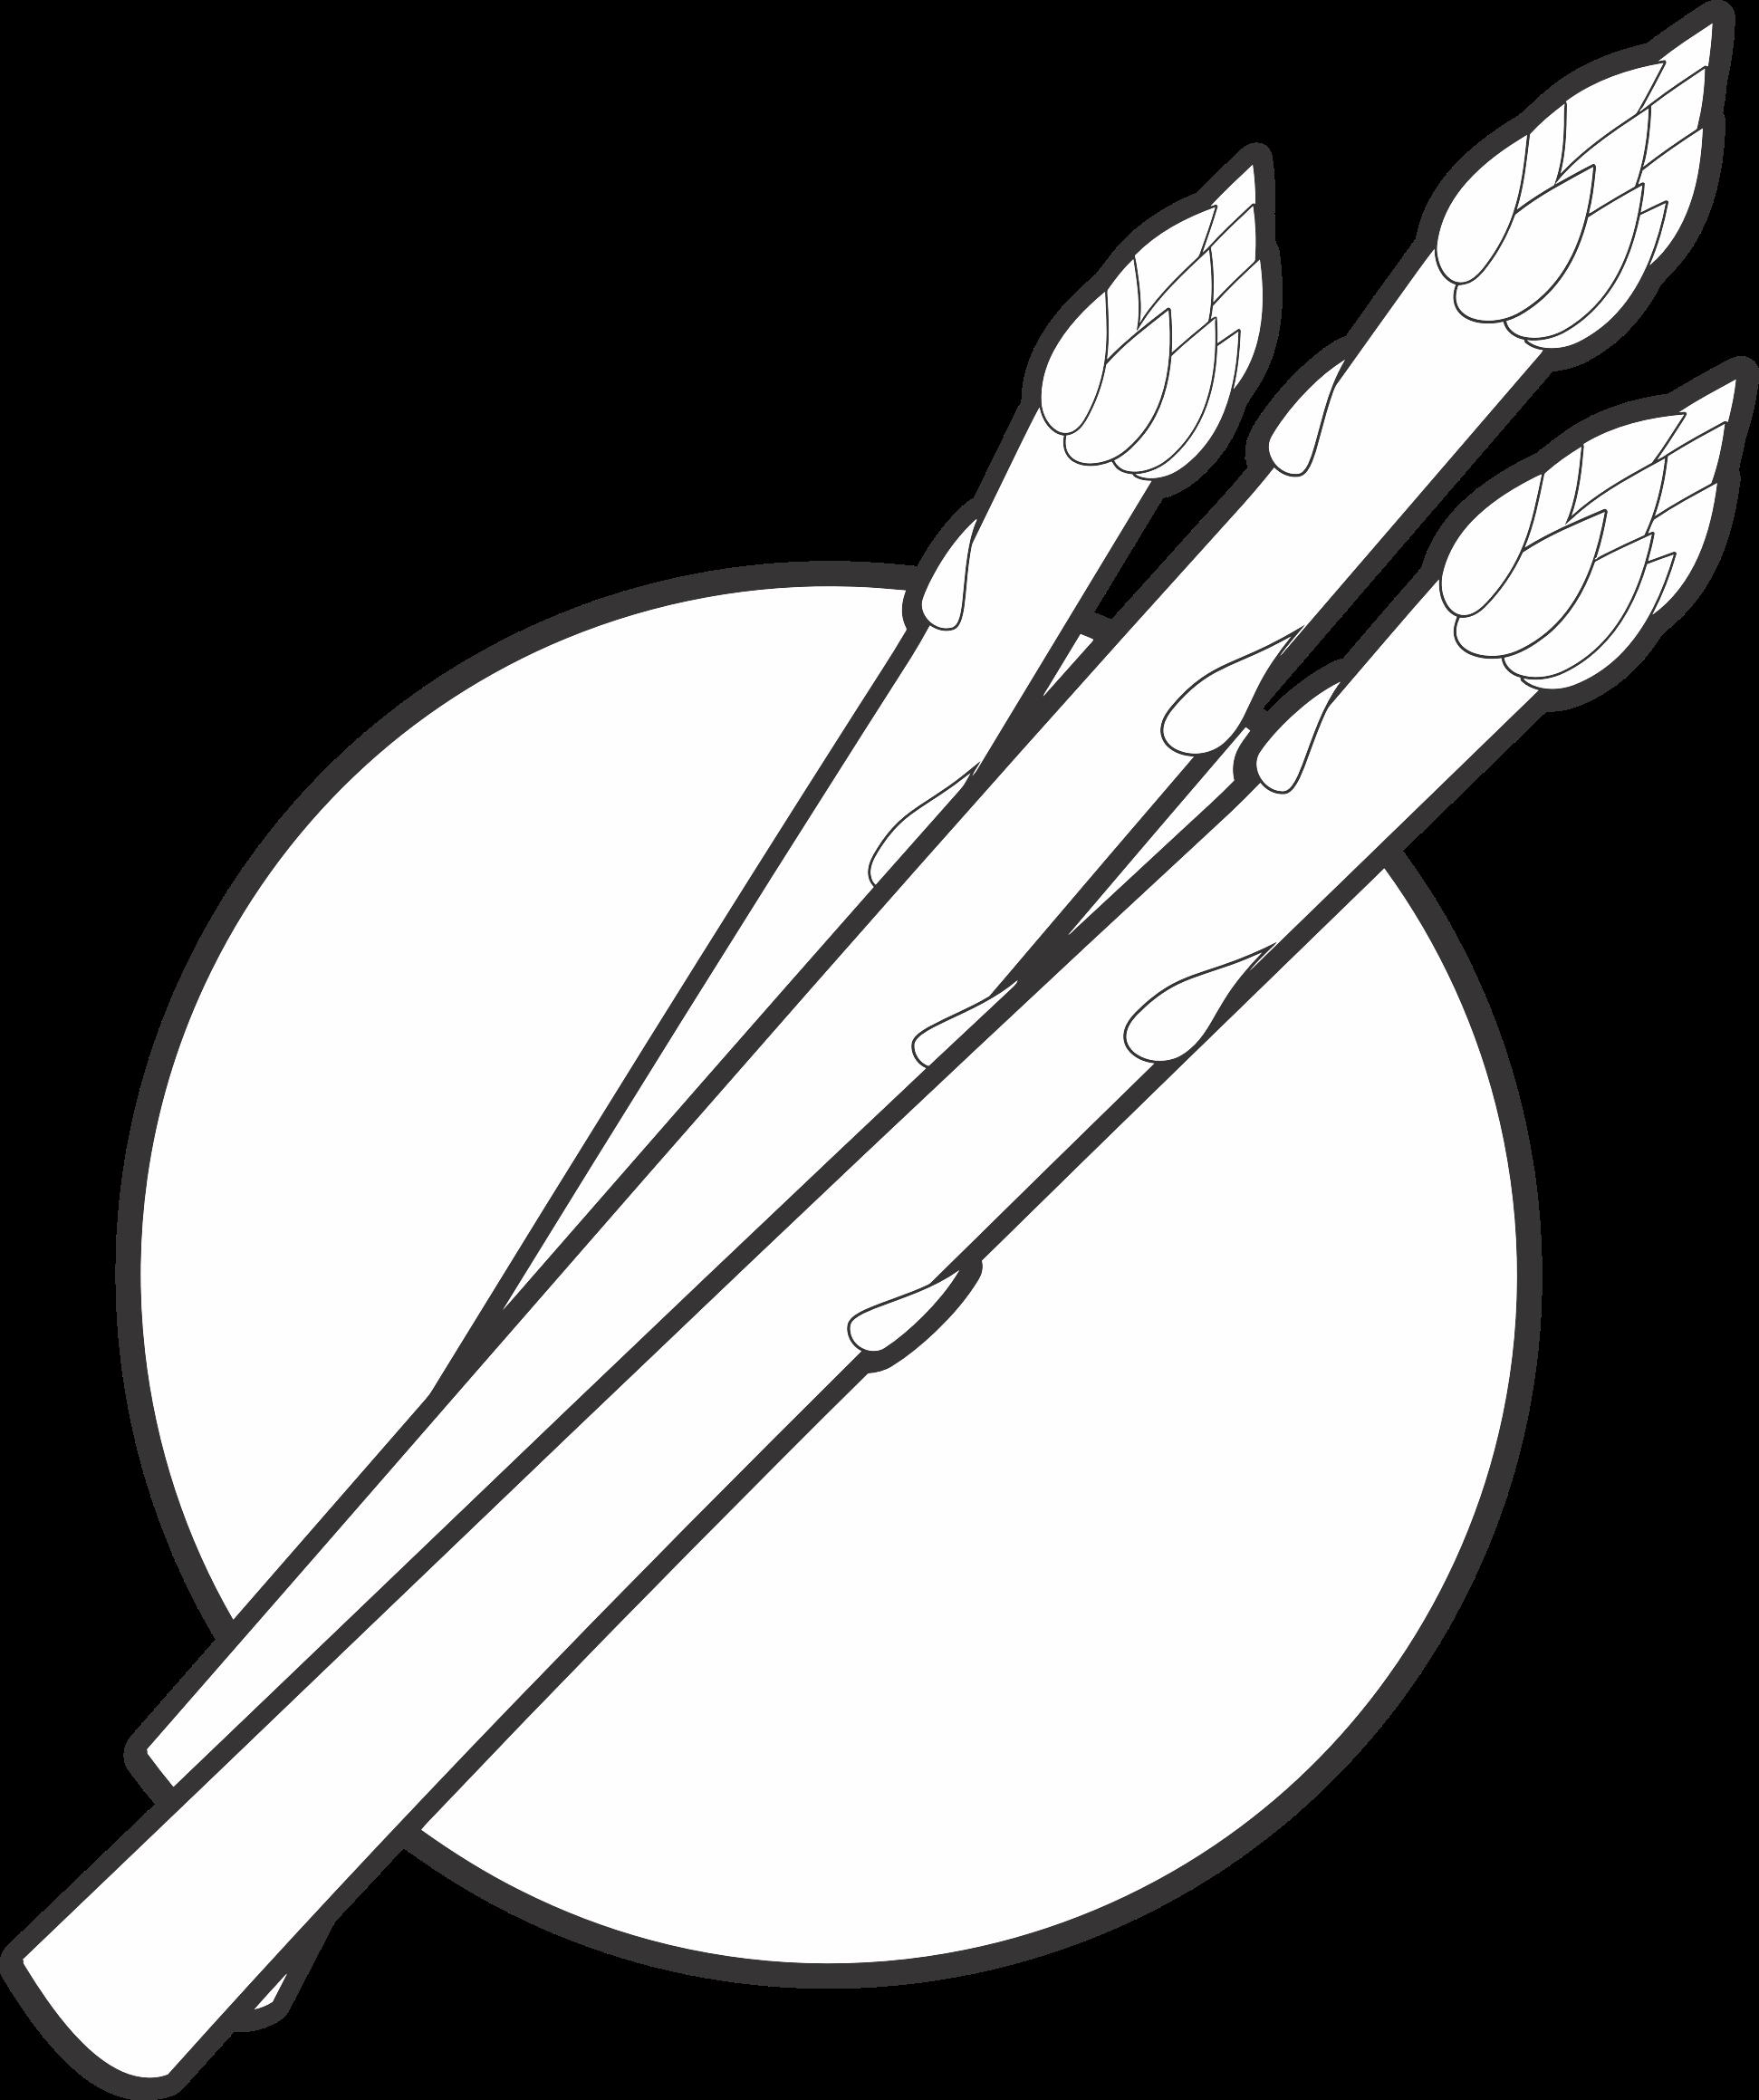 Line Art Vector Design Png : Clipart asparagus line art logo